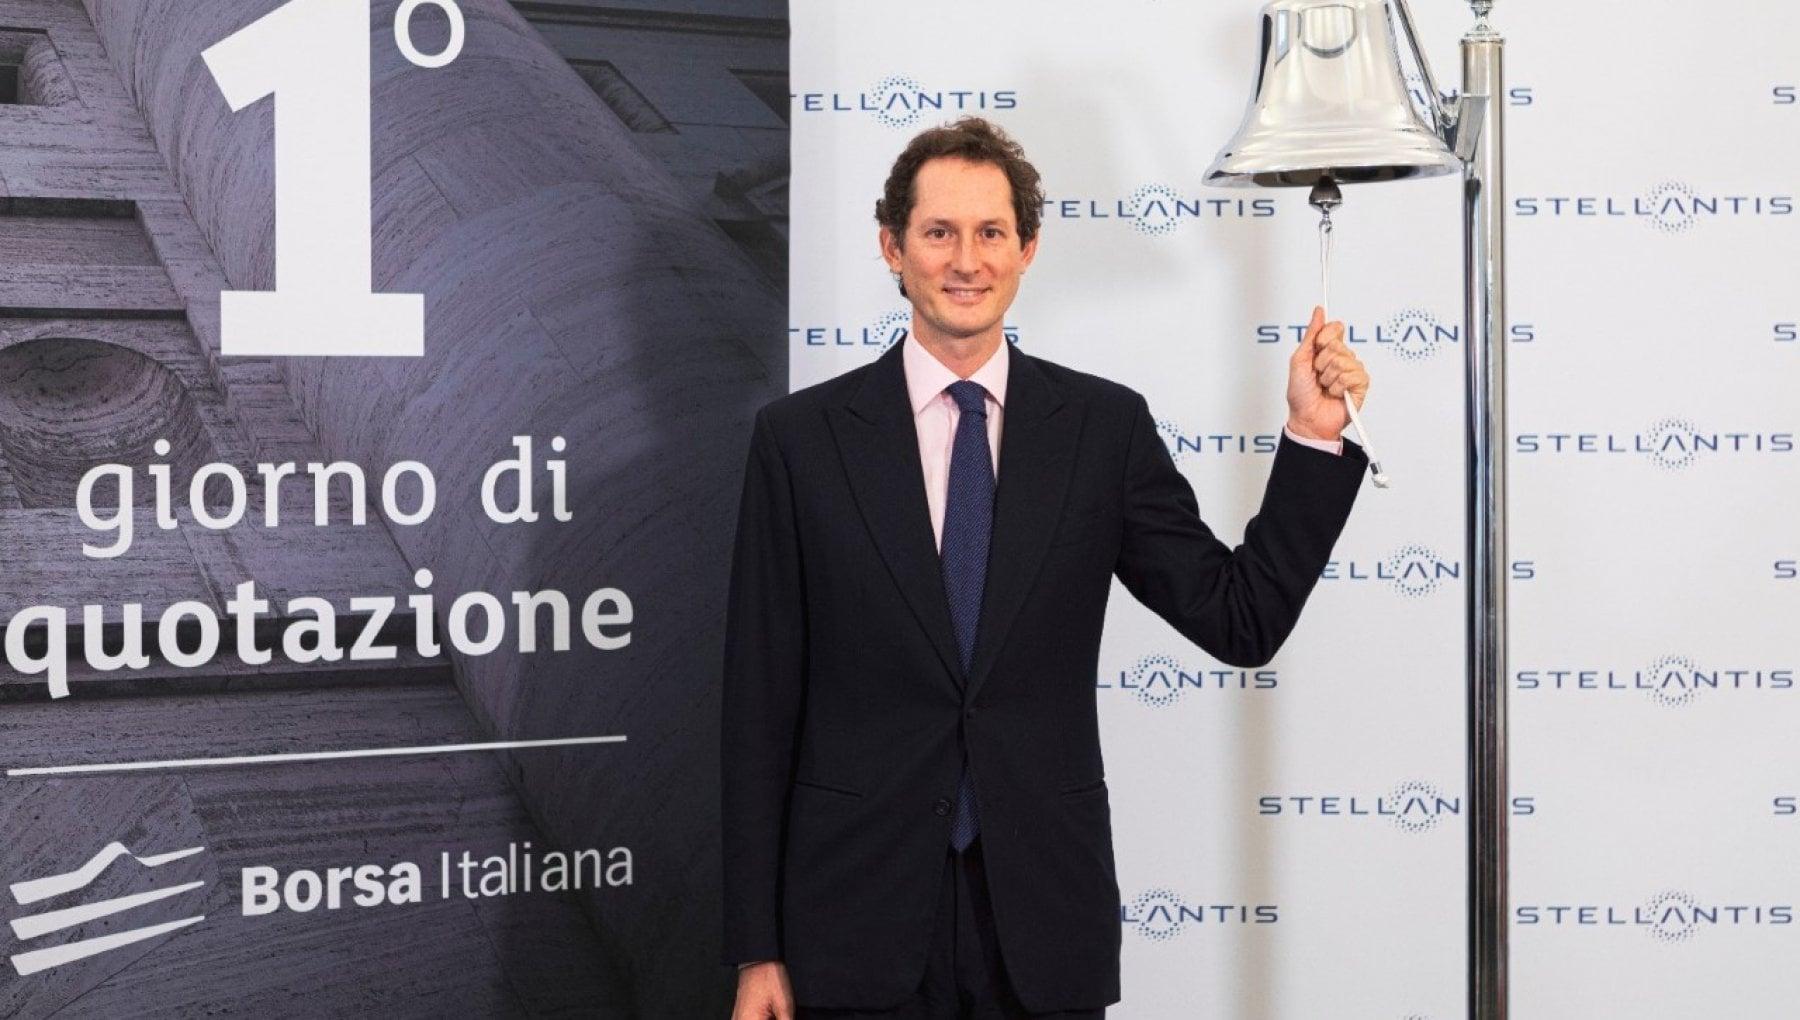 Stellantis debutta in Borsa a Milano e Parigi. Elkann Traguardo storico grande opportunita